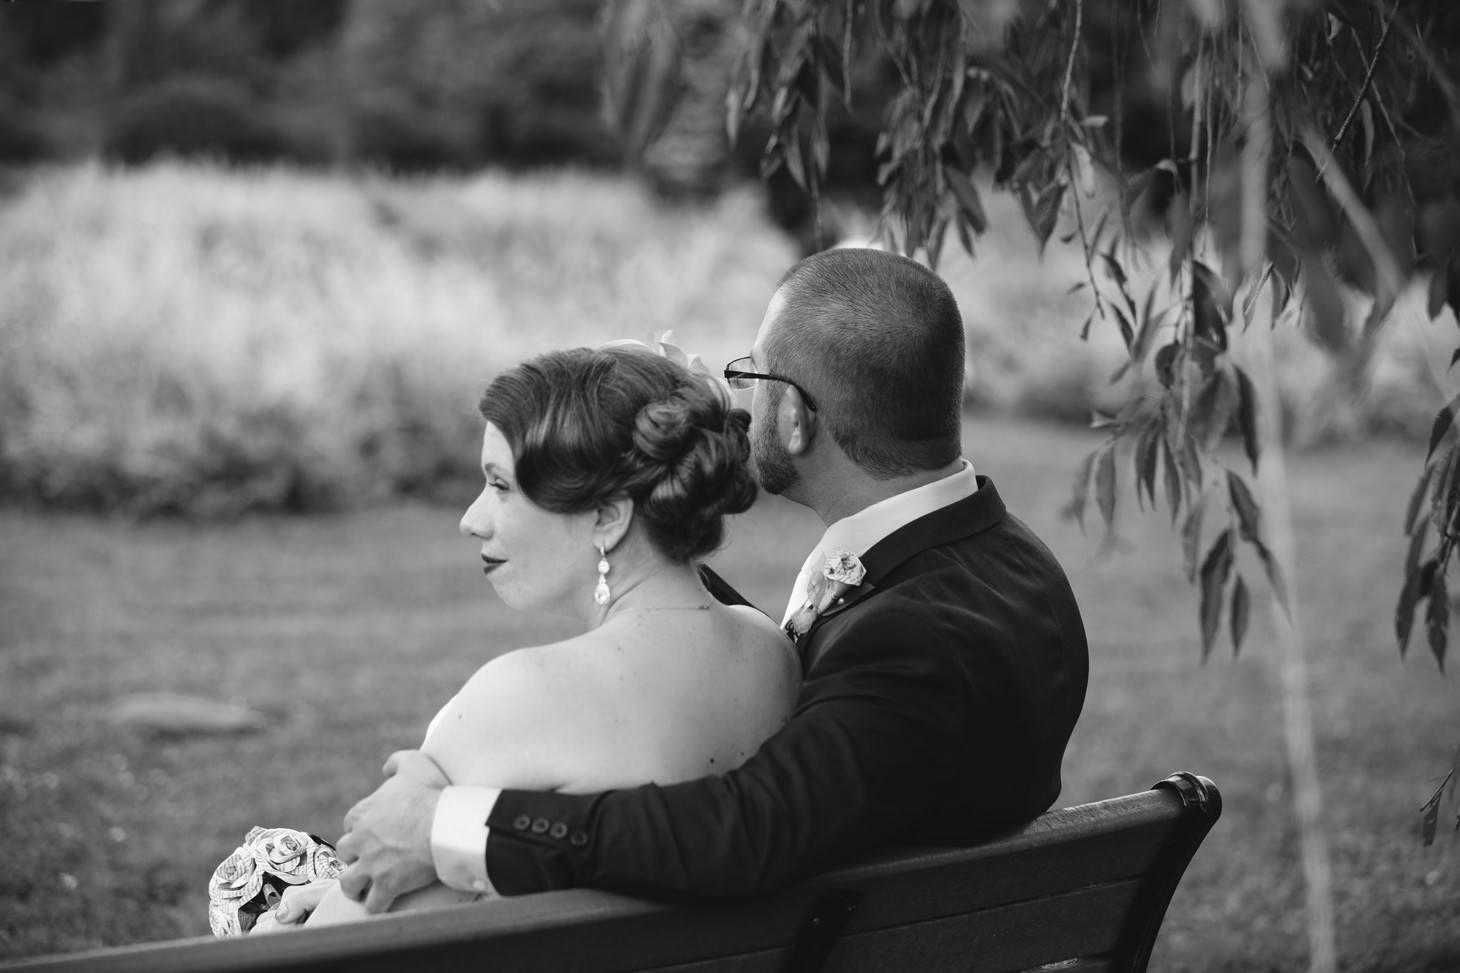 019-nyc-wedding-photographer-nj-nerdy-dr-who-firehouse-wedding-smitten-chickens.jpg